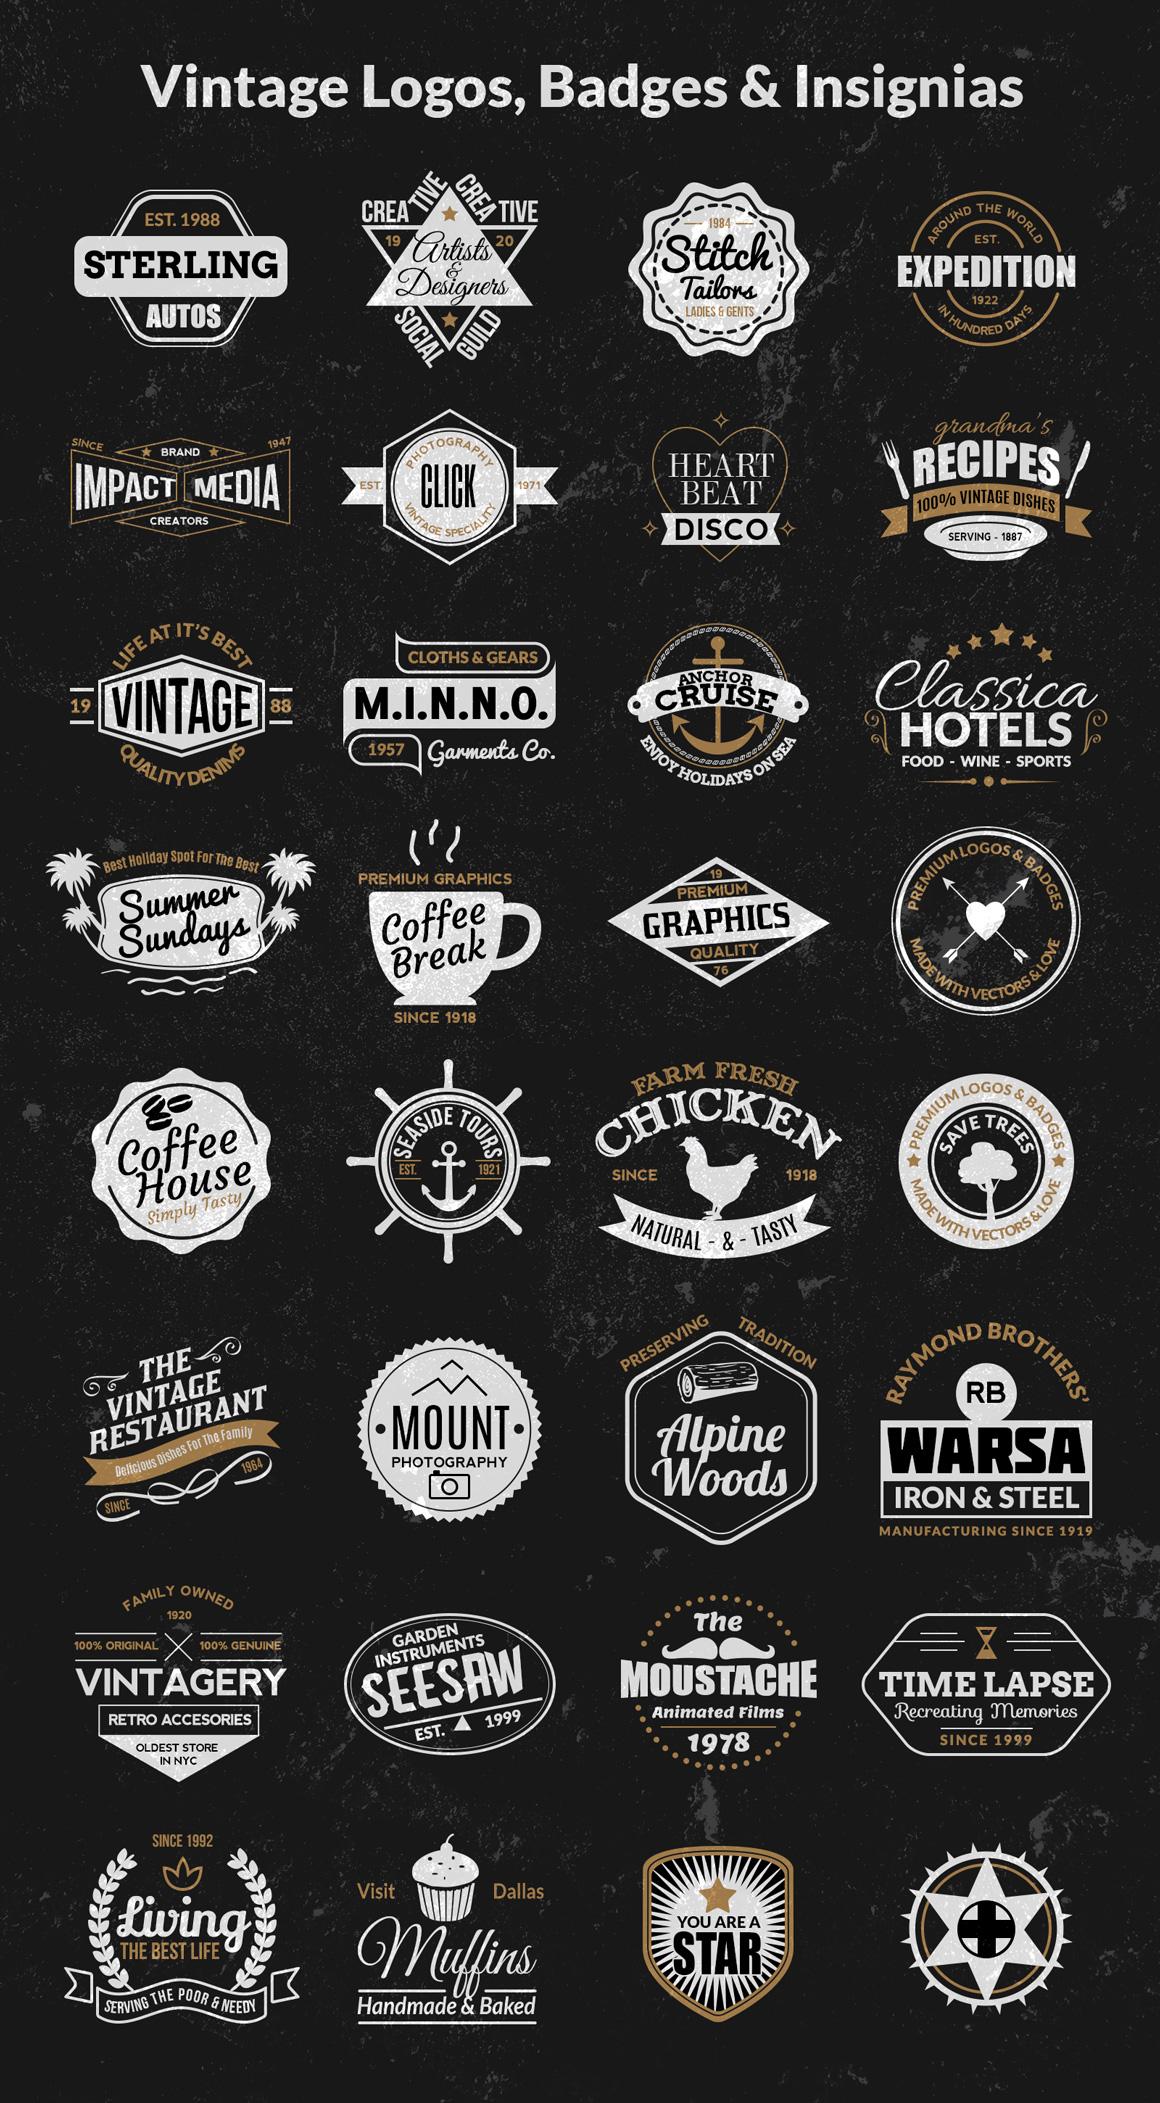 bonus-logos-badges-insignias-colored